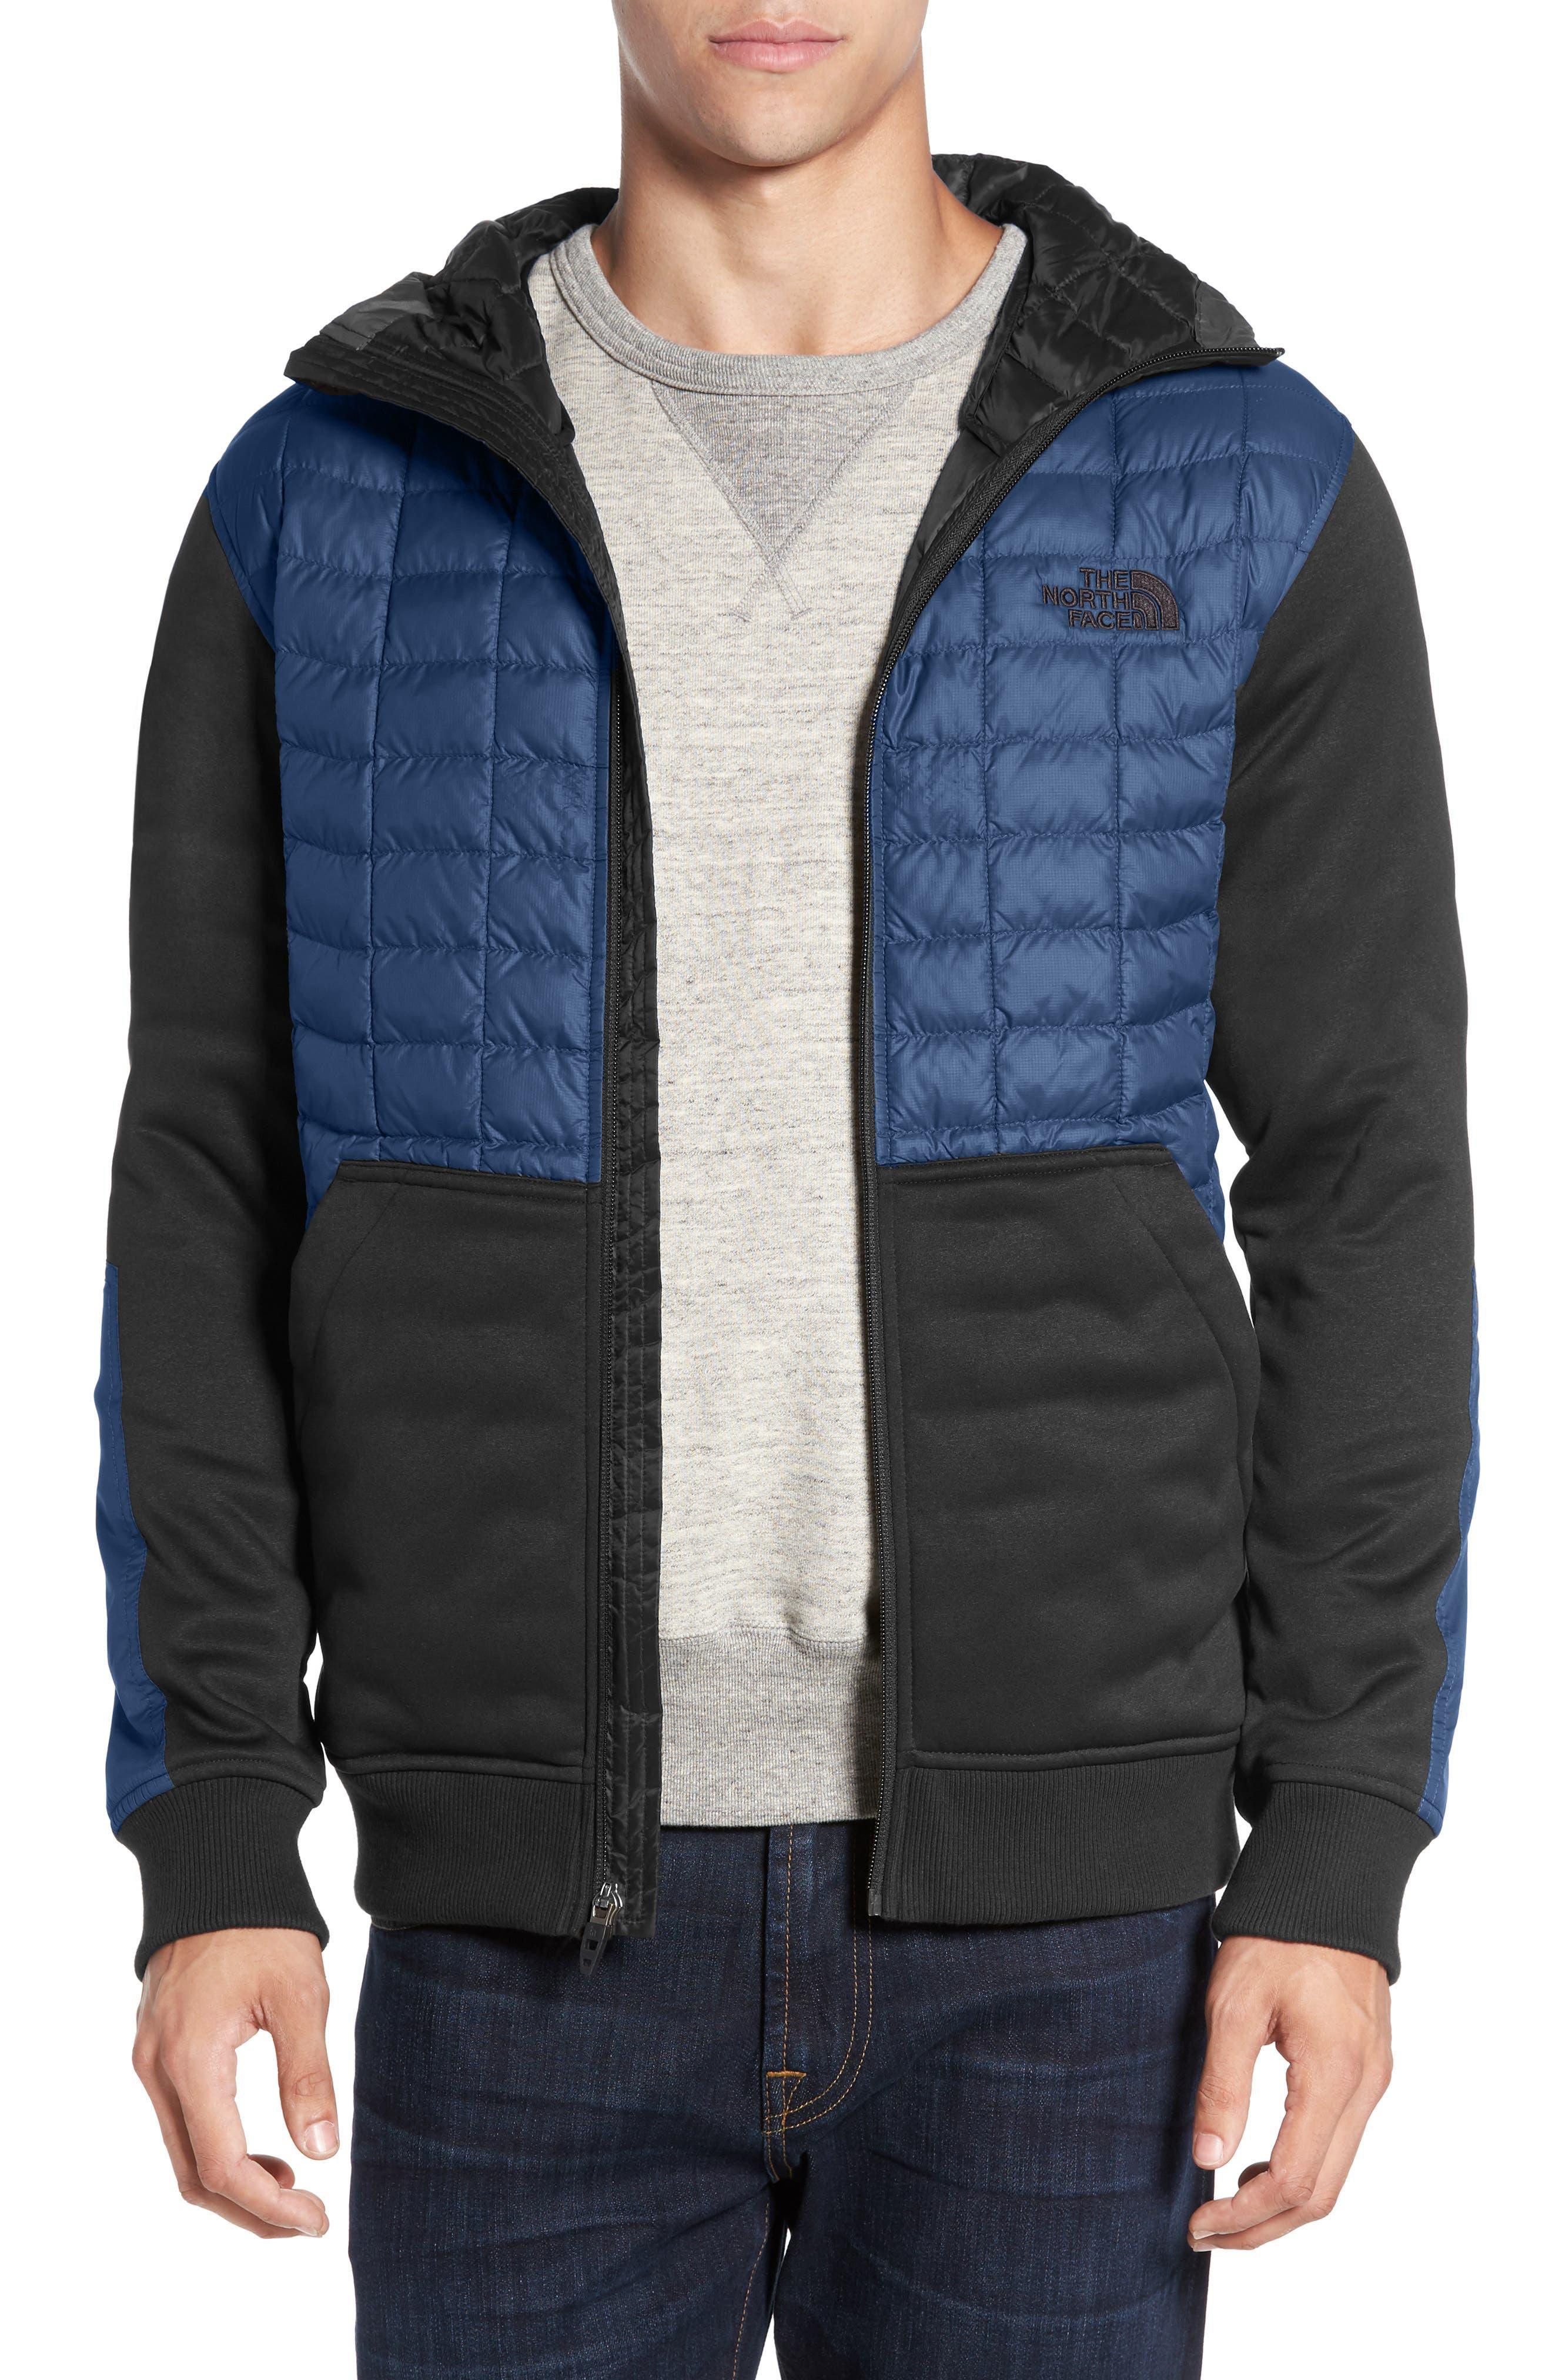 Main Image - The North Face 'Kilowatt' ThermoBall PrimaLoft® Hooded Jacket